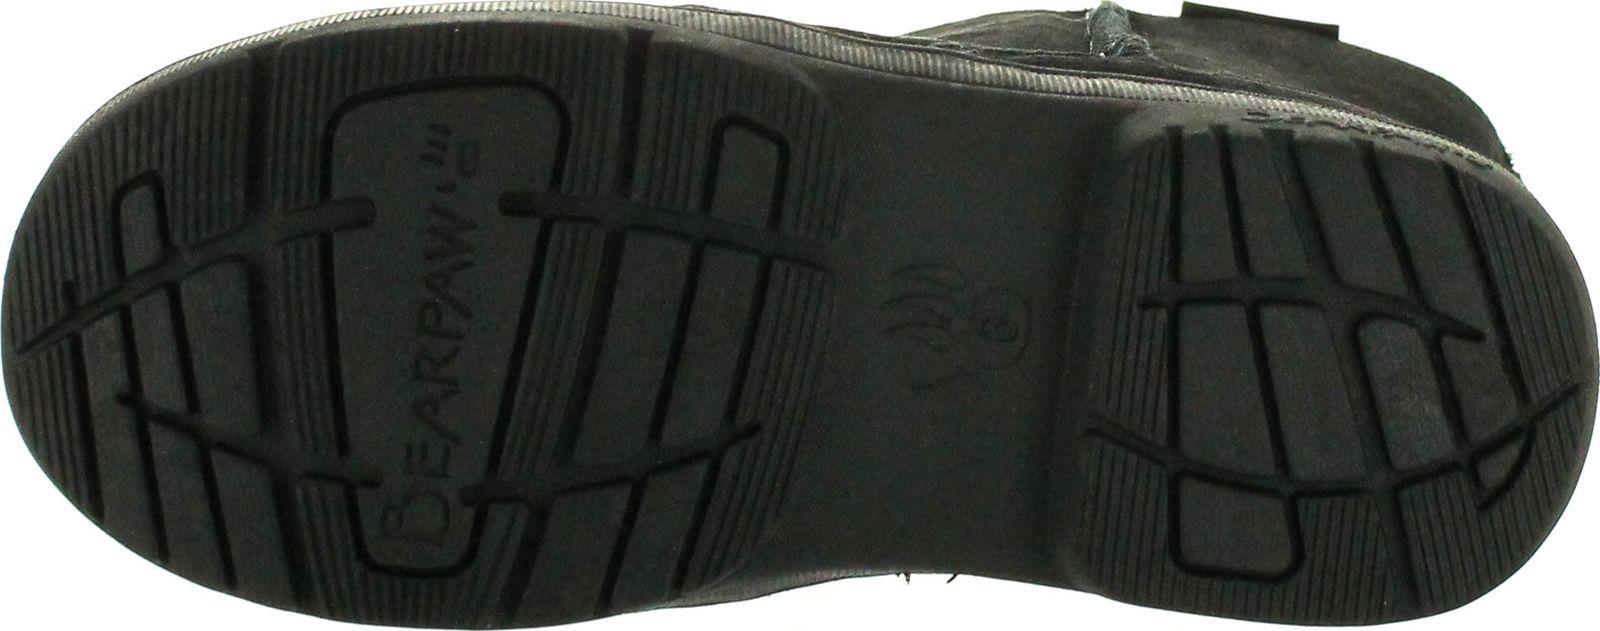 Bearpaw Damenschuhe Suede Meadow 605W Suede Damenschuhe Stiefel 3c36b7